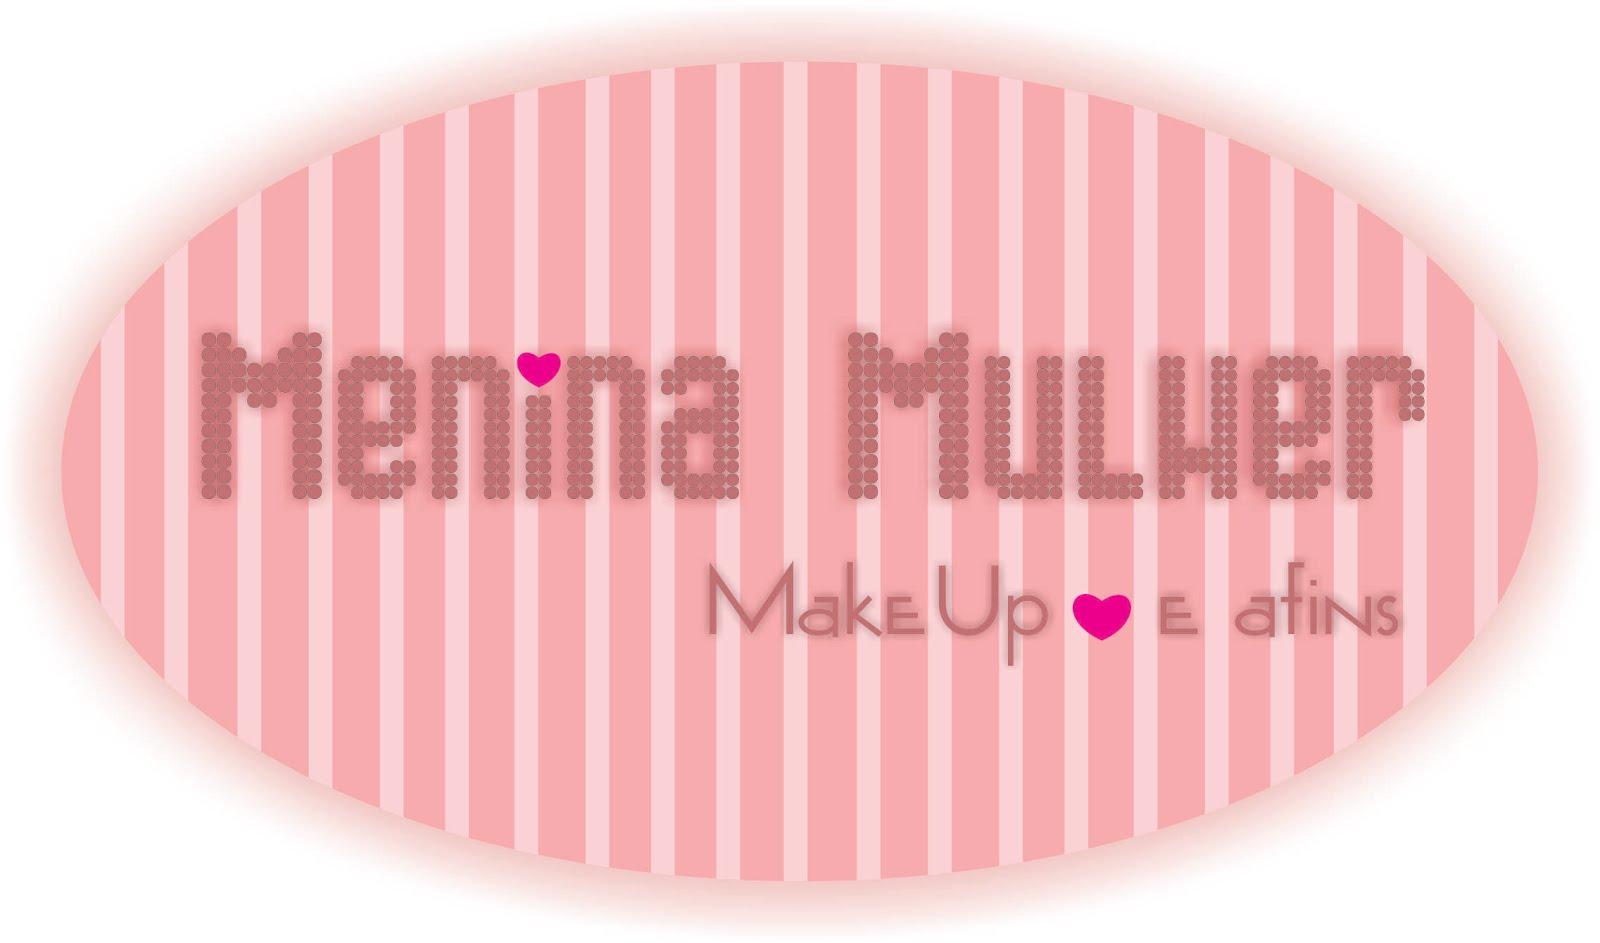 Menina Mulher Make Up